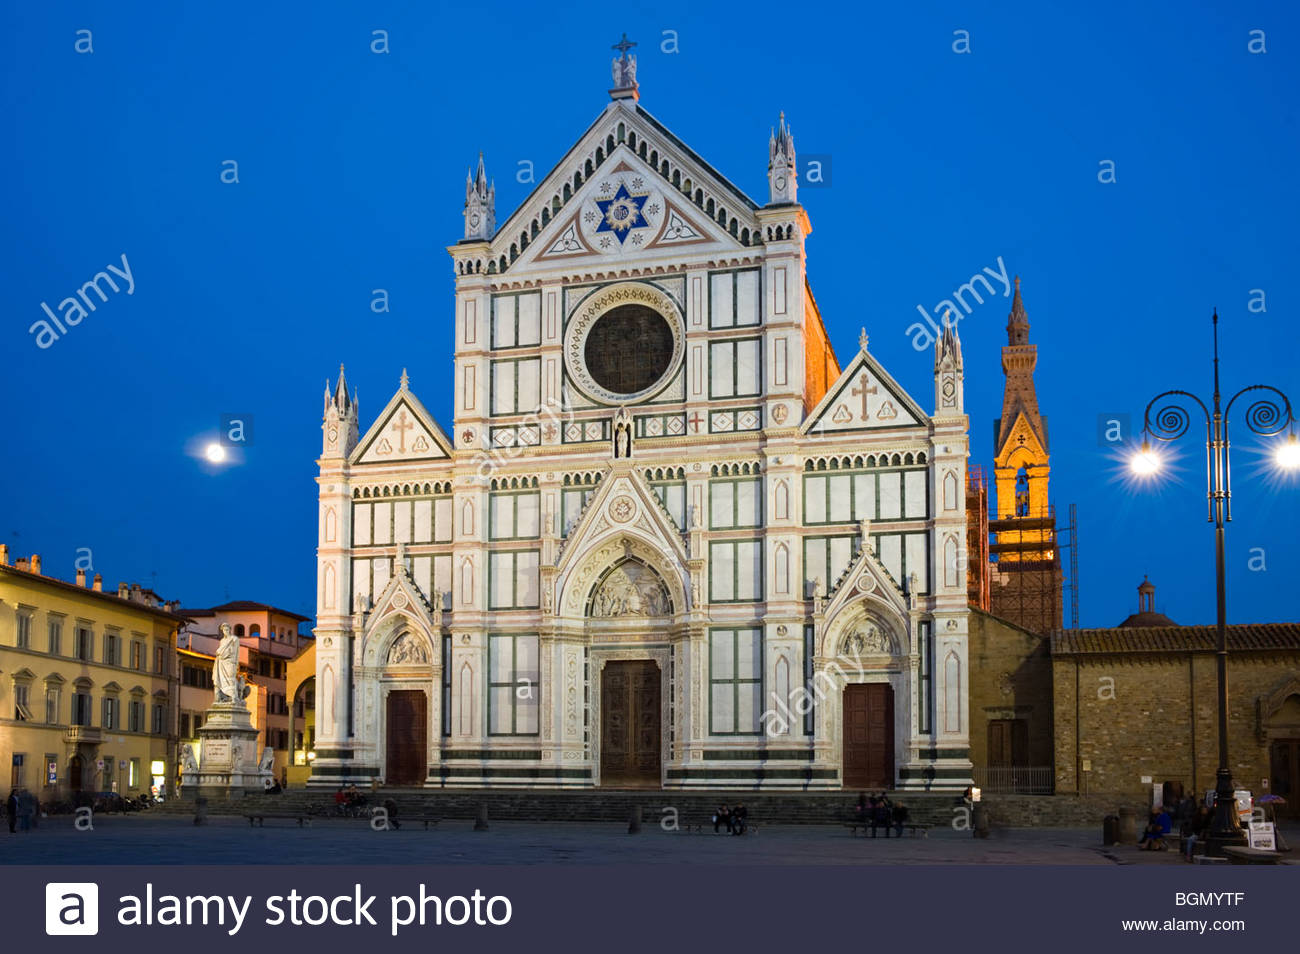 Basilica di Santa Croce, Florenz, Italien. Stockbild